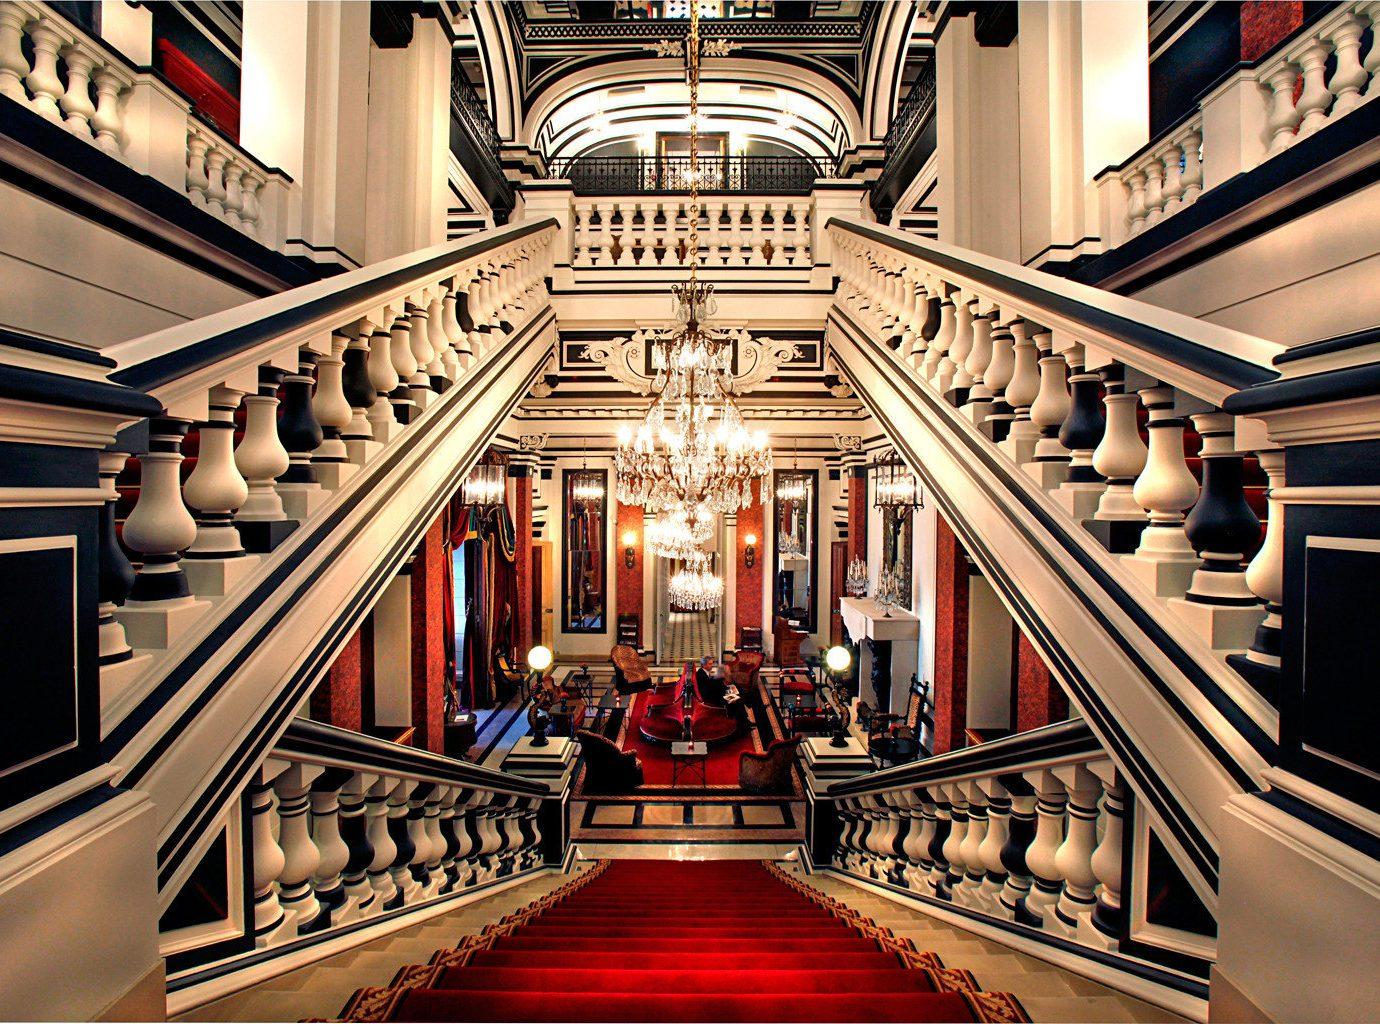 City Elegant France Historic Hotels Lobby Paris Romantic indoor symmetry hall